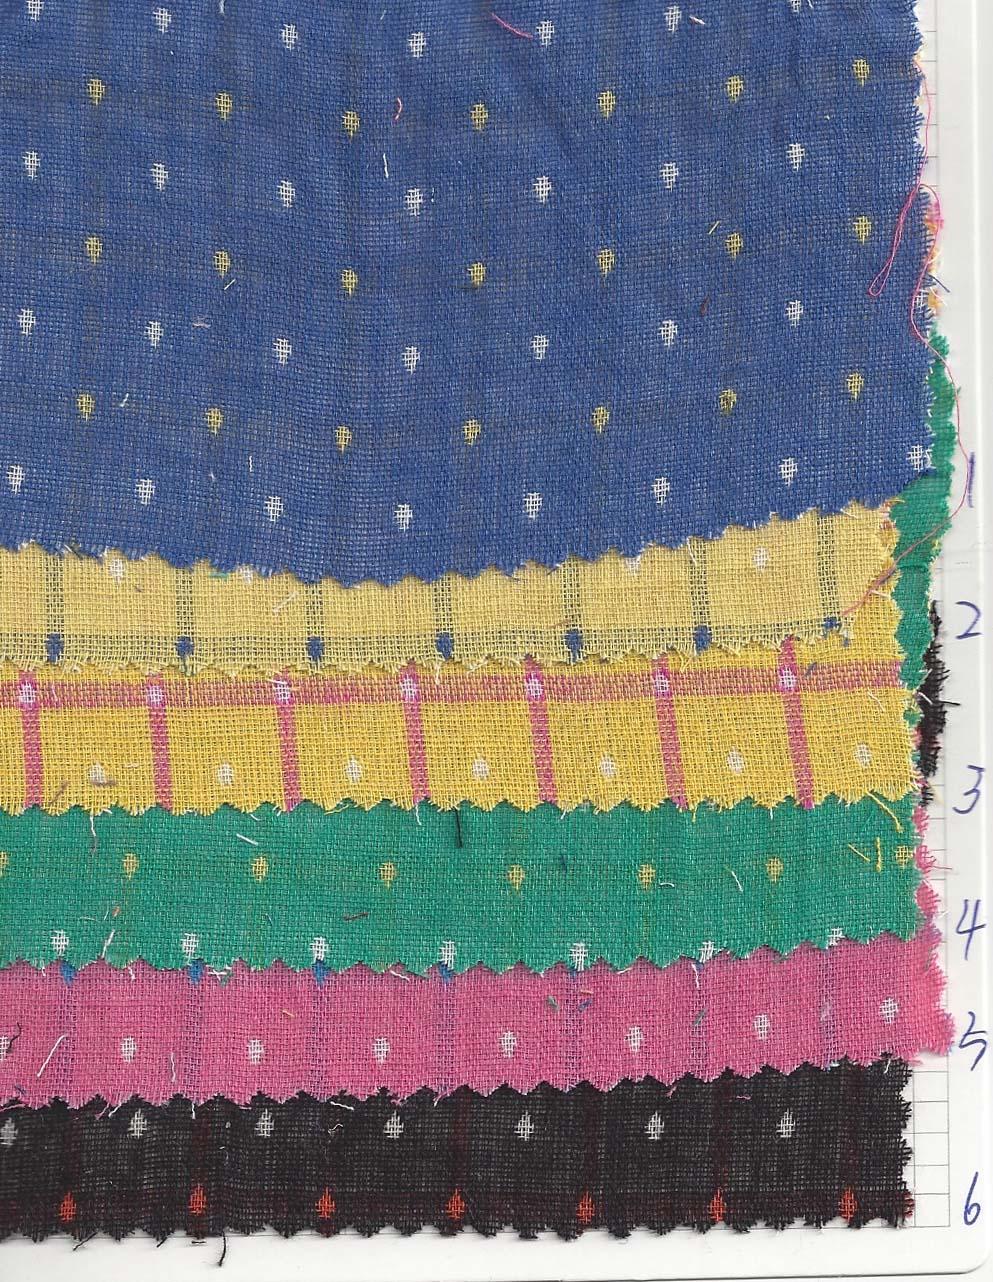 Xiao Xiao Textile C1321.jpg